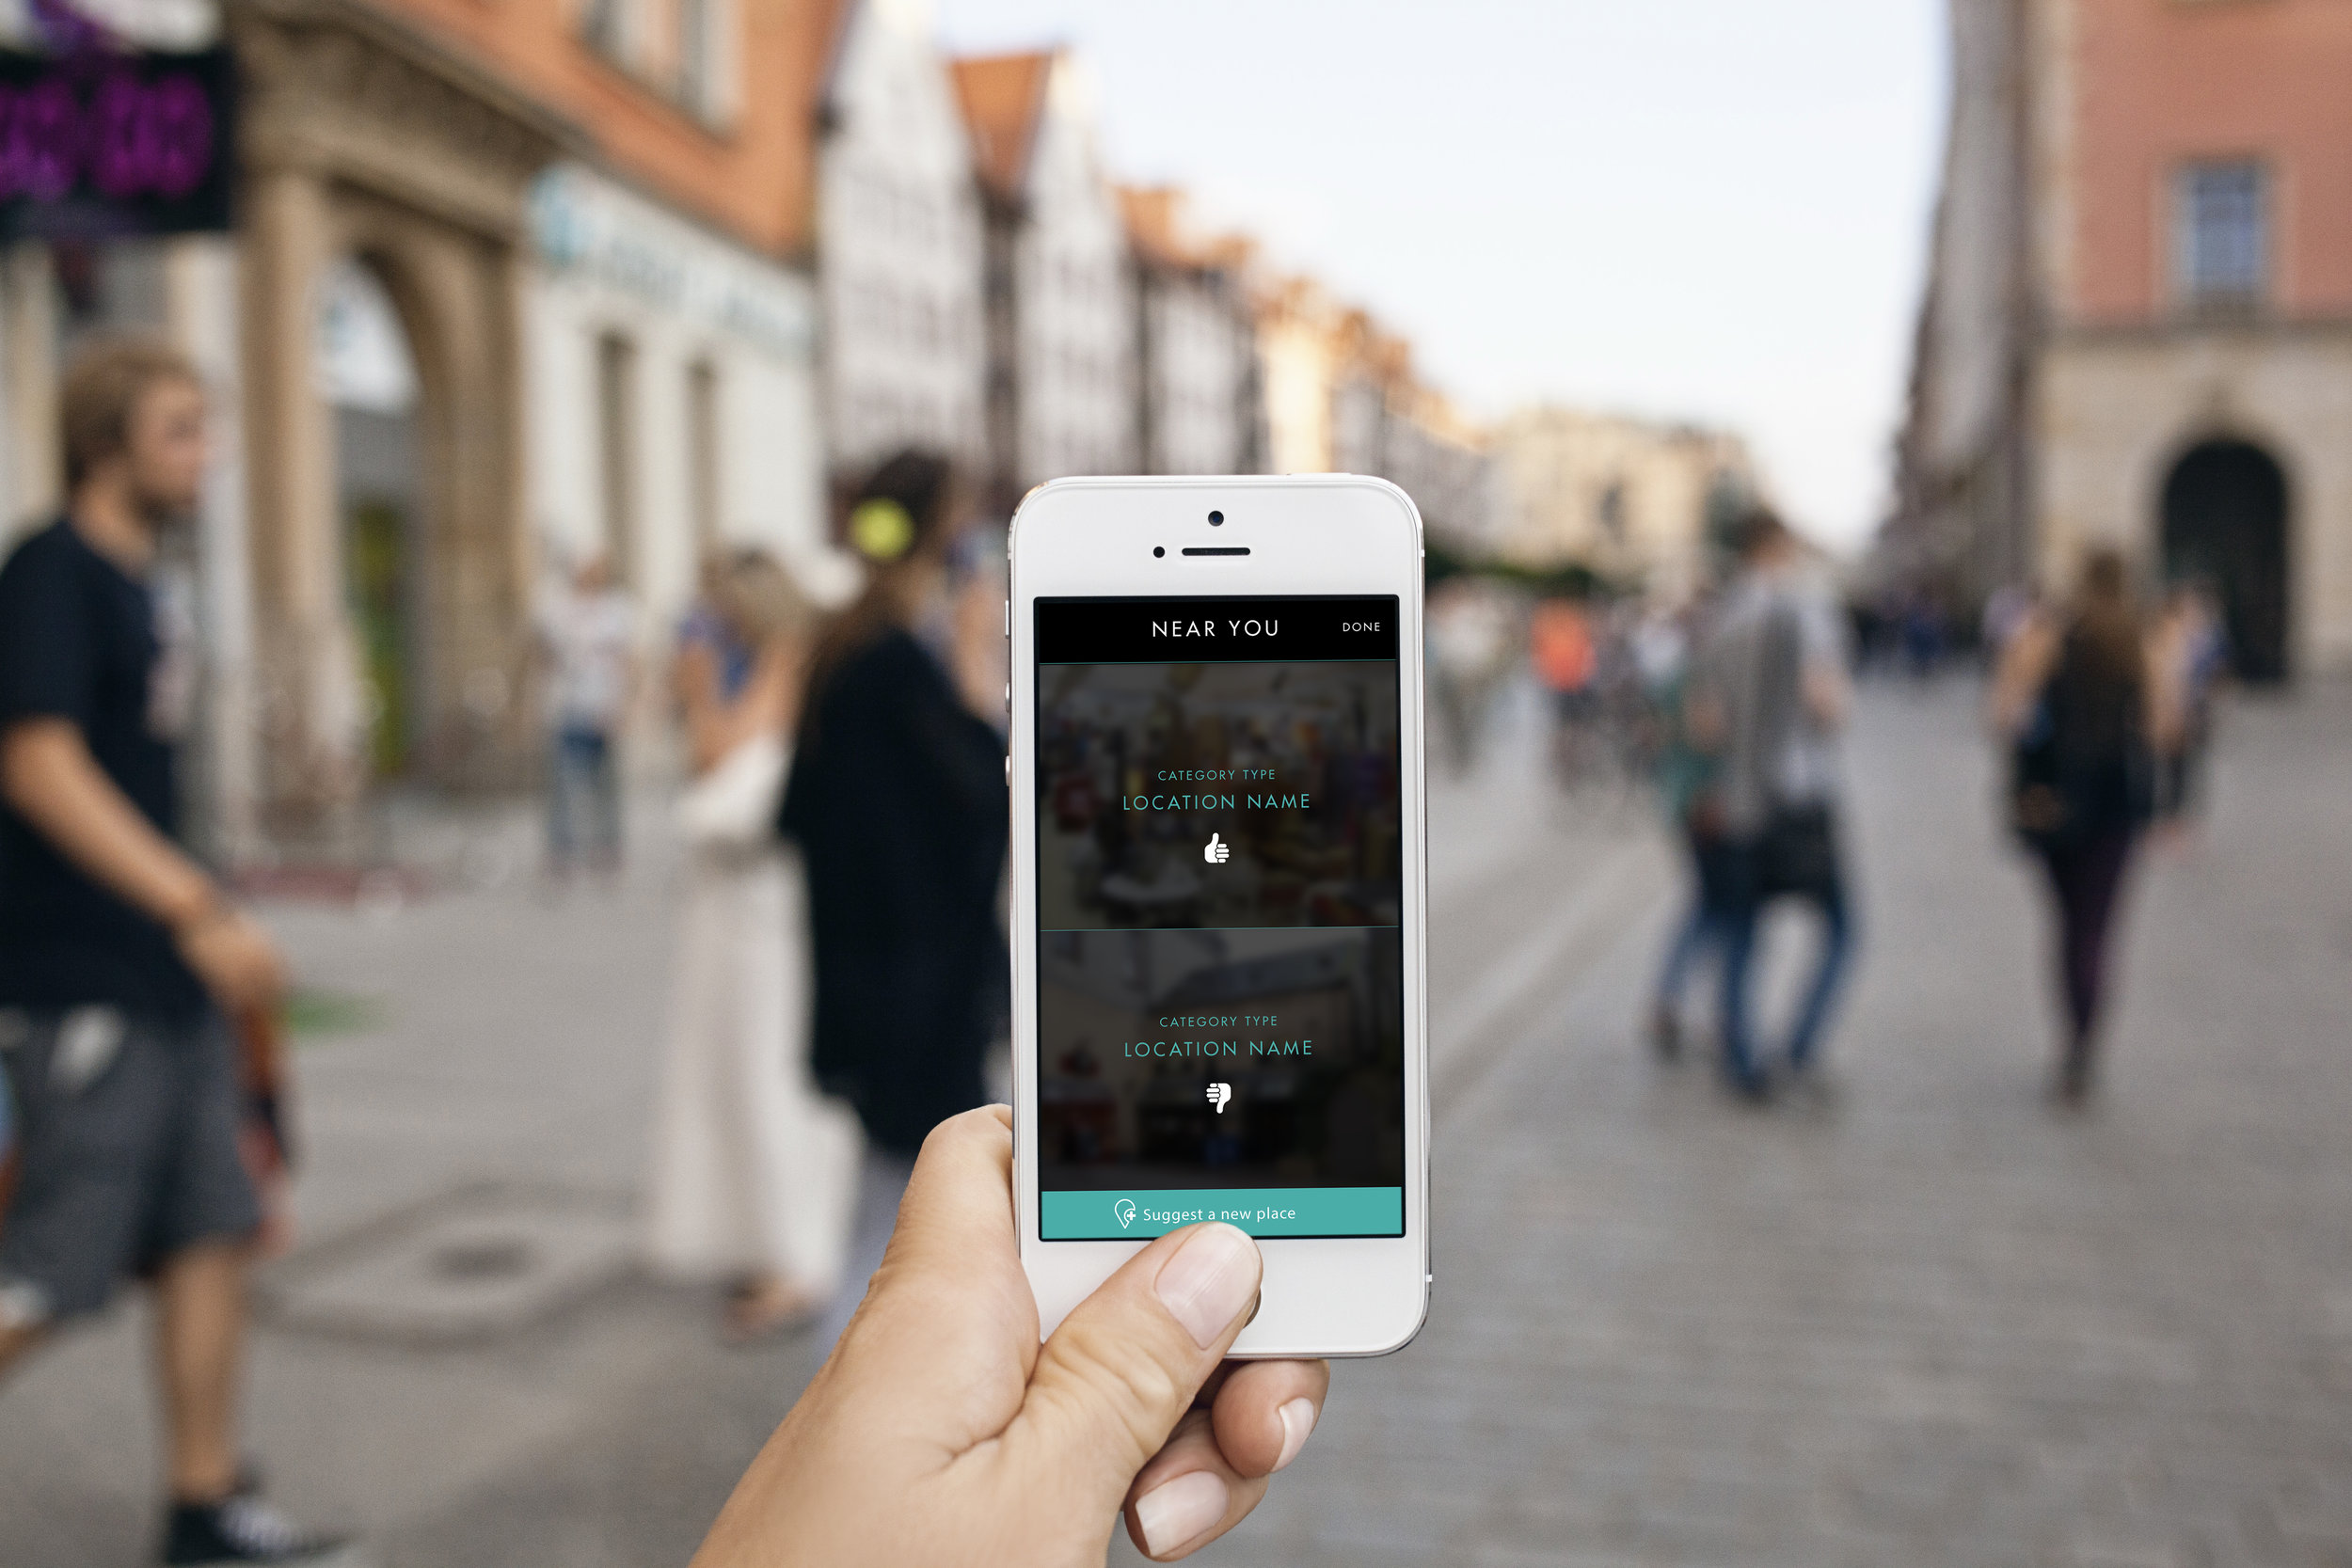 iPhone-5S-Urban-Photo-Mockupc.jpg